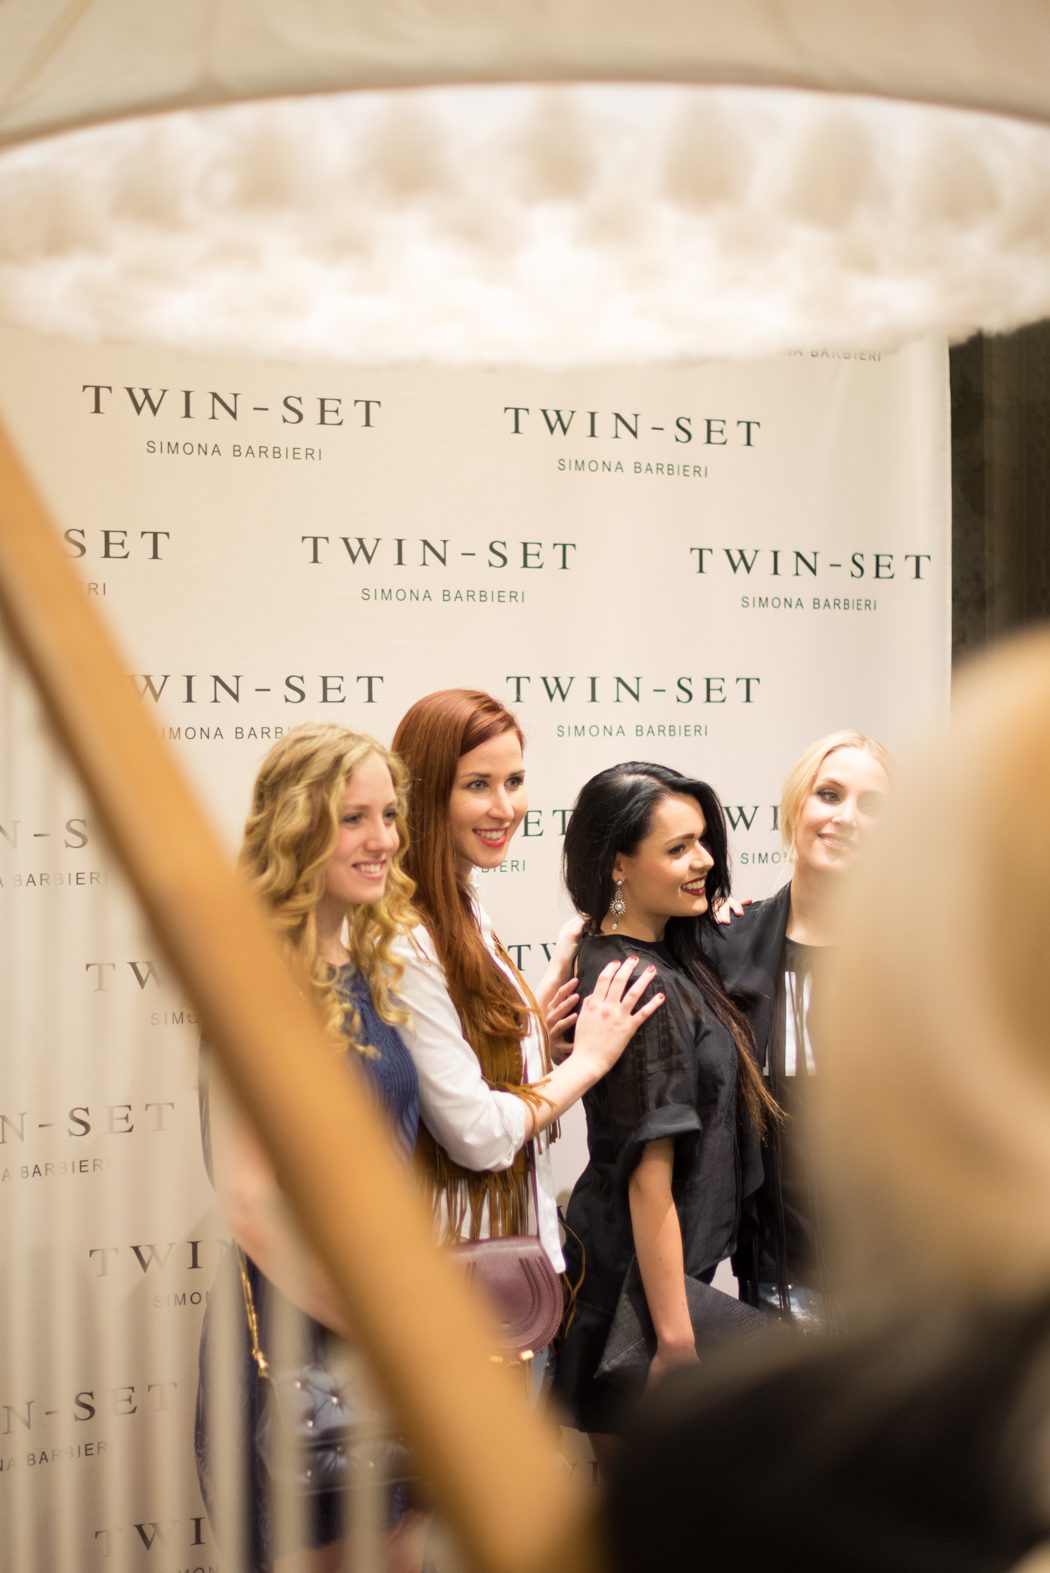 Twin-Set-Opening-München-Store-Munich-Monaco-Simona-Barbieri-Fashionblogger-München-Fashionblog-Deutschland-Blog-Lifestyle-Lindarella-8